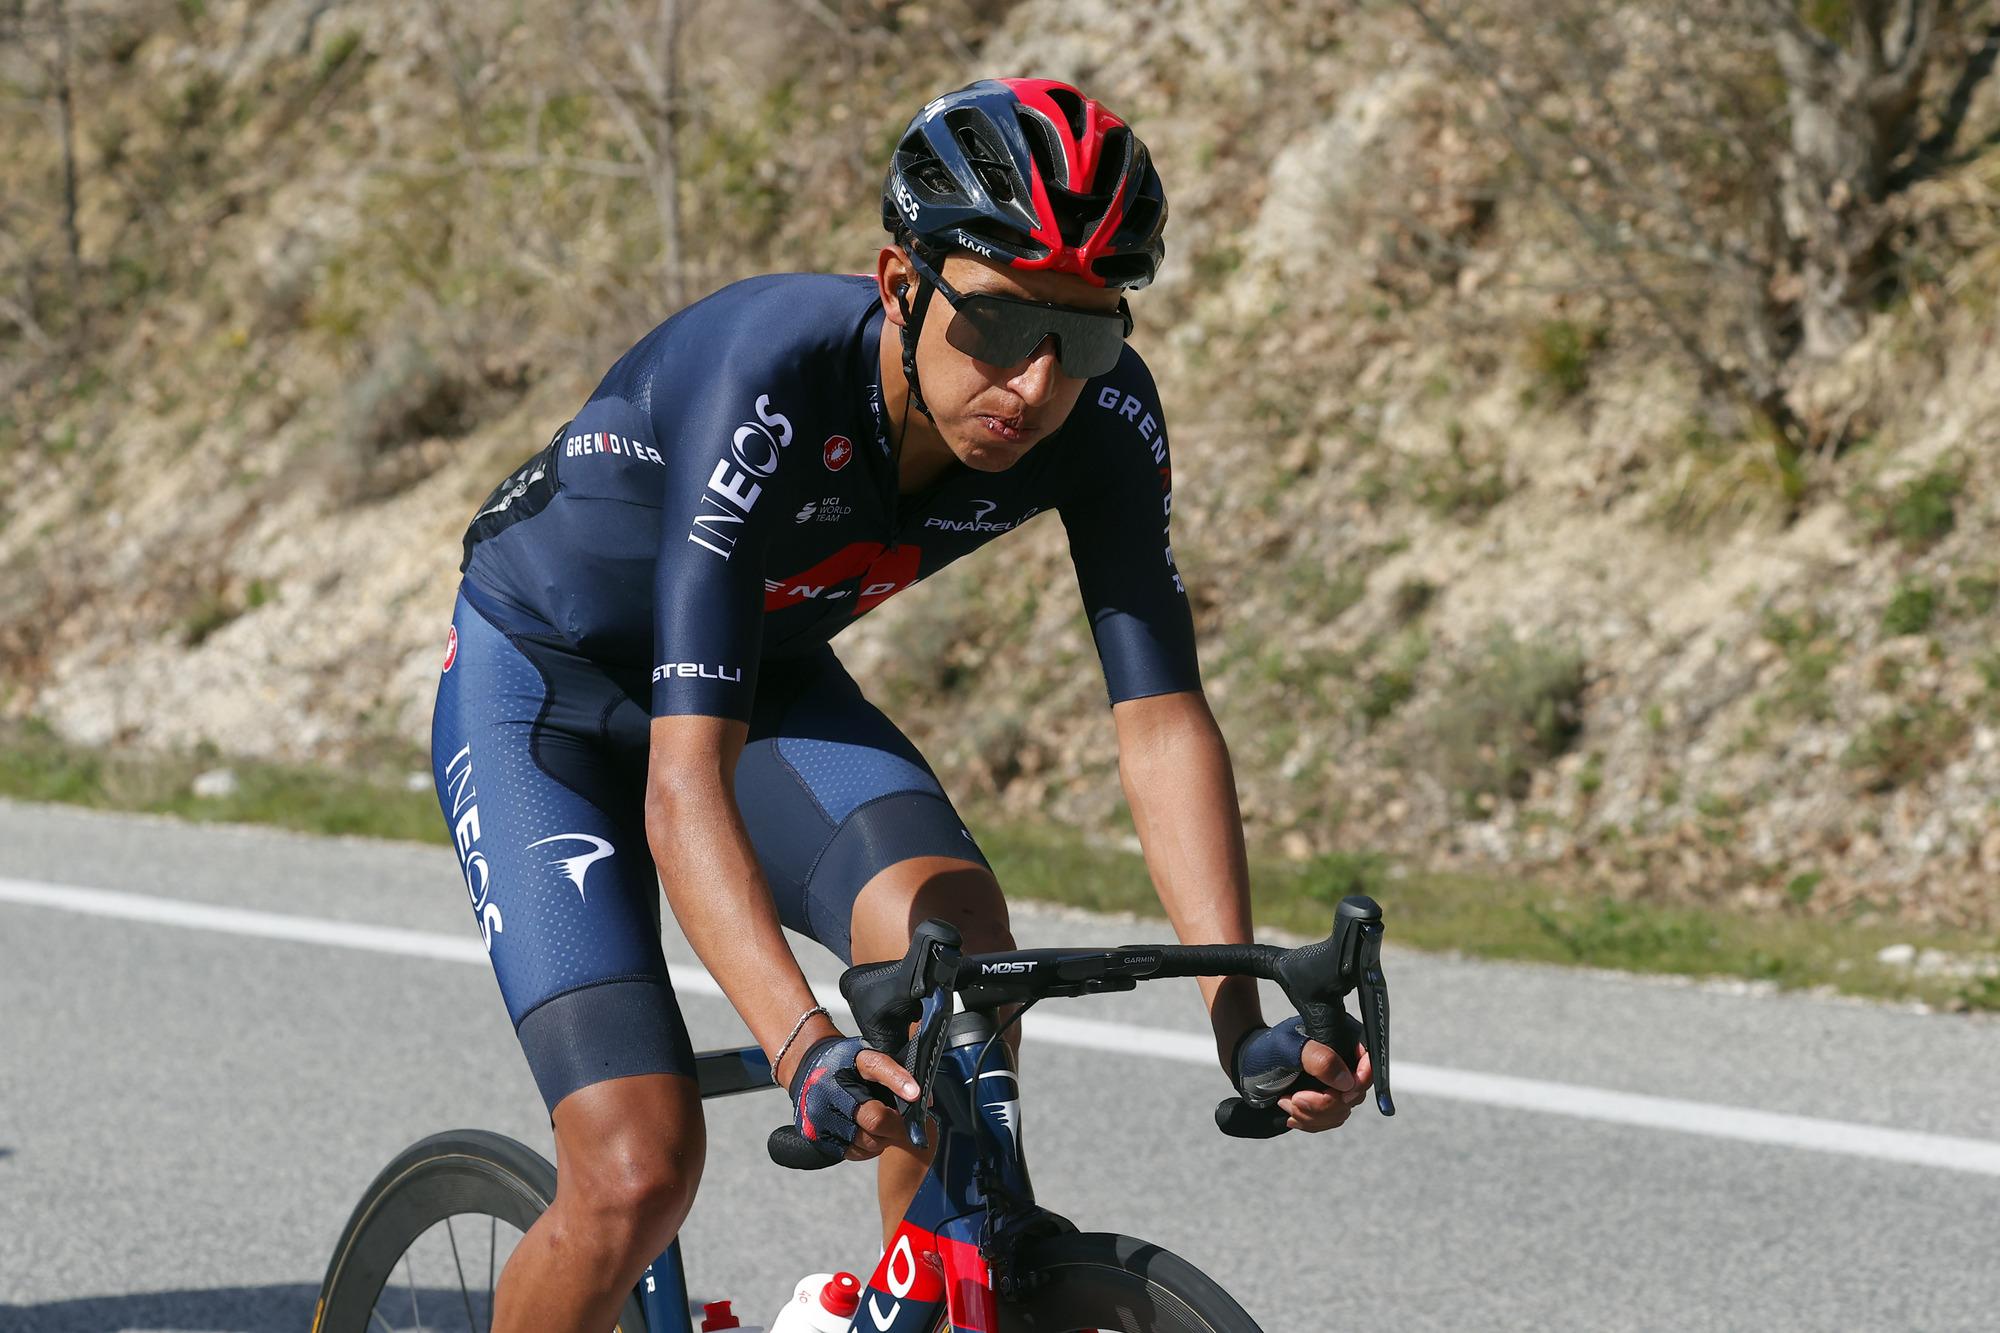 Tirreno Adriatico 2021 - 56th Edition - 4th stage Terni - Prati di Tivo 148km - 13/03/2021 - Egan Bernal (COL - Ineos Grenadiers) - photo Luca Bettini/BettiniPhoto©2021